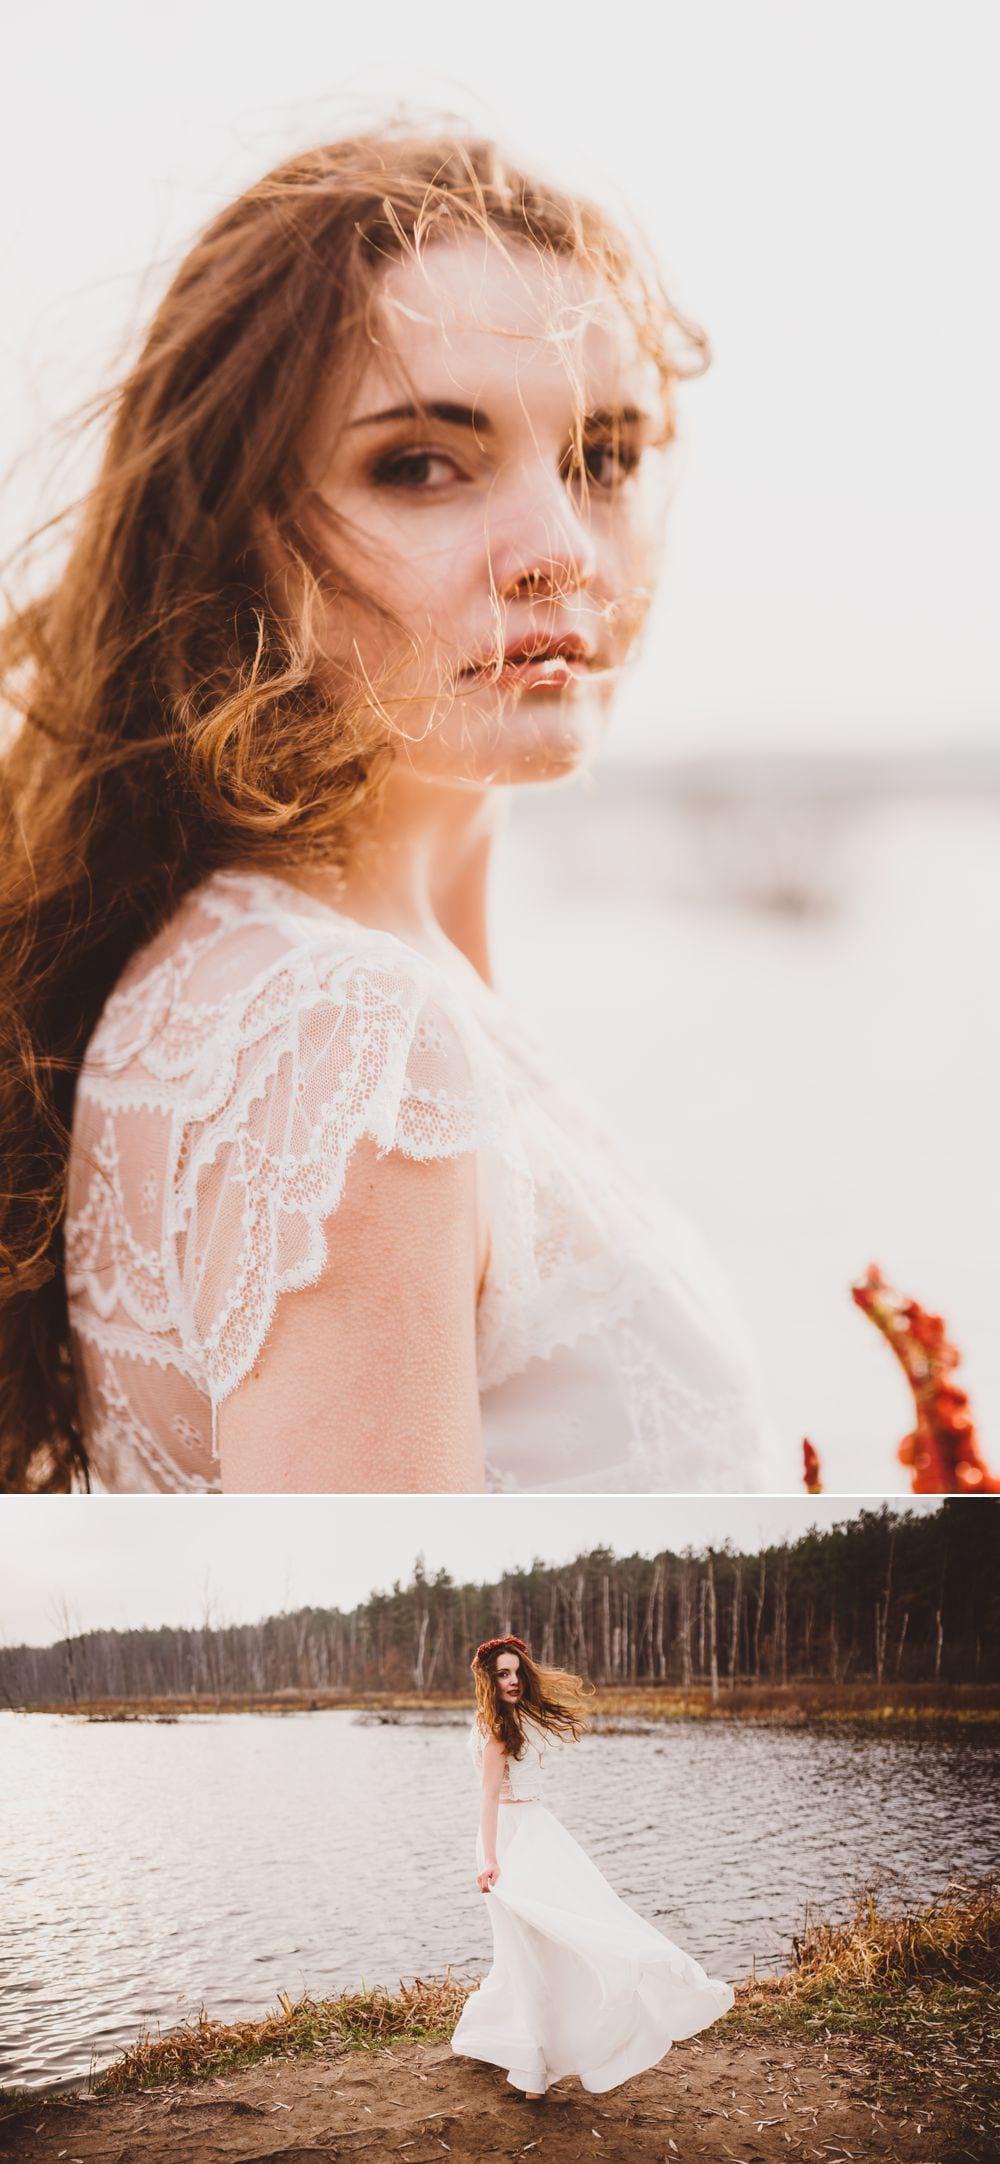 Edytorial MariFoto fotografia Eva